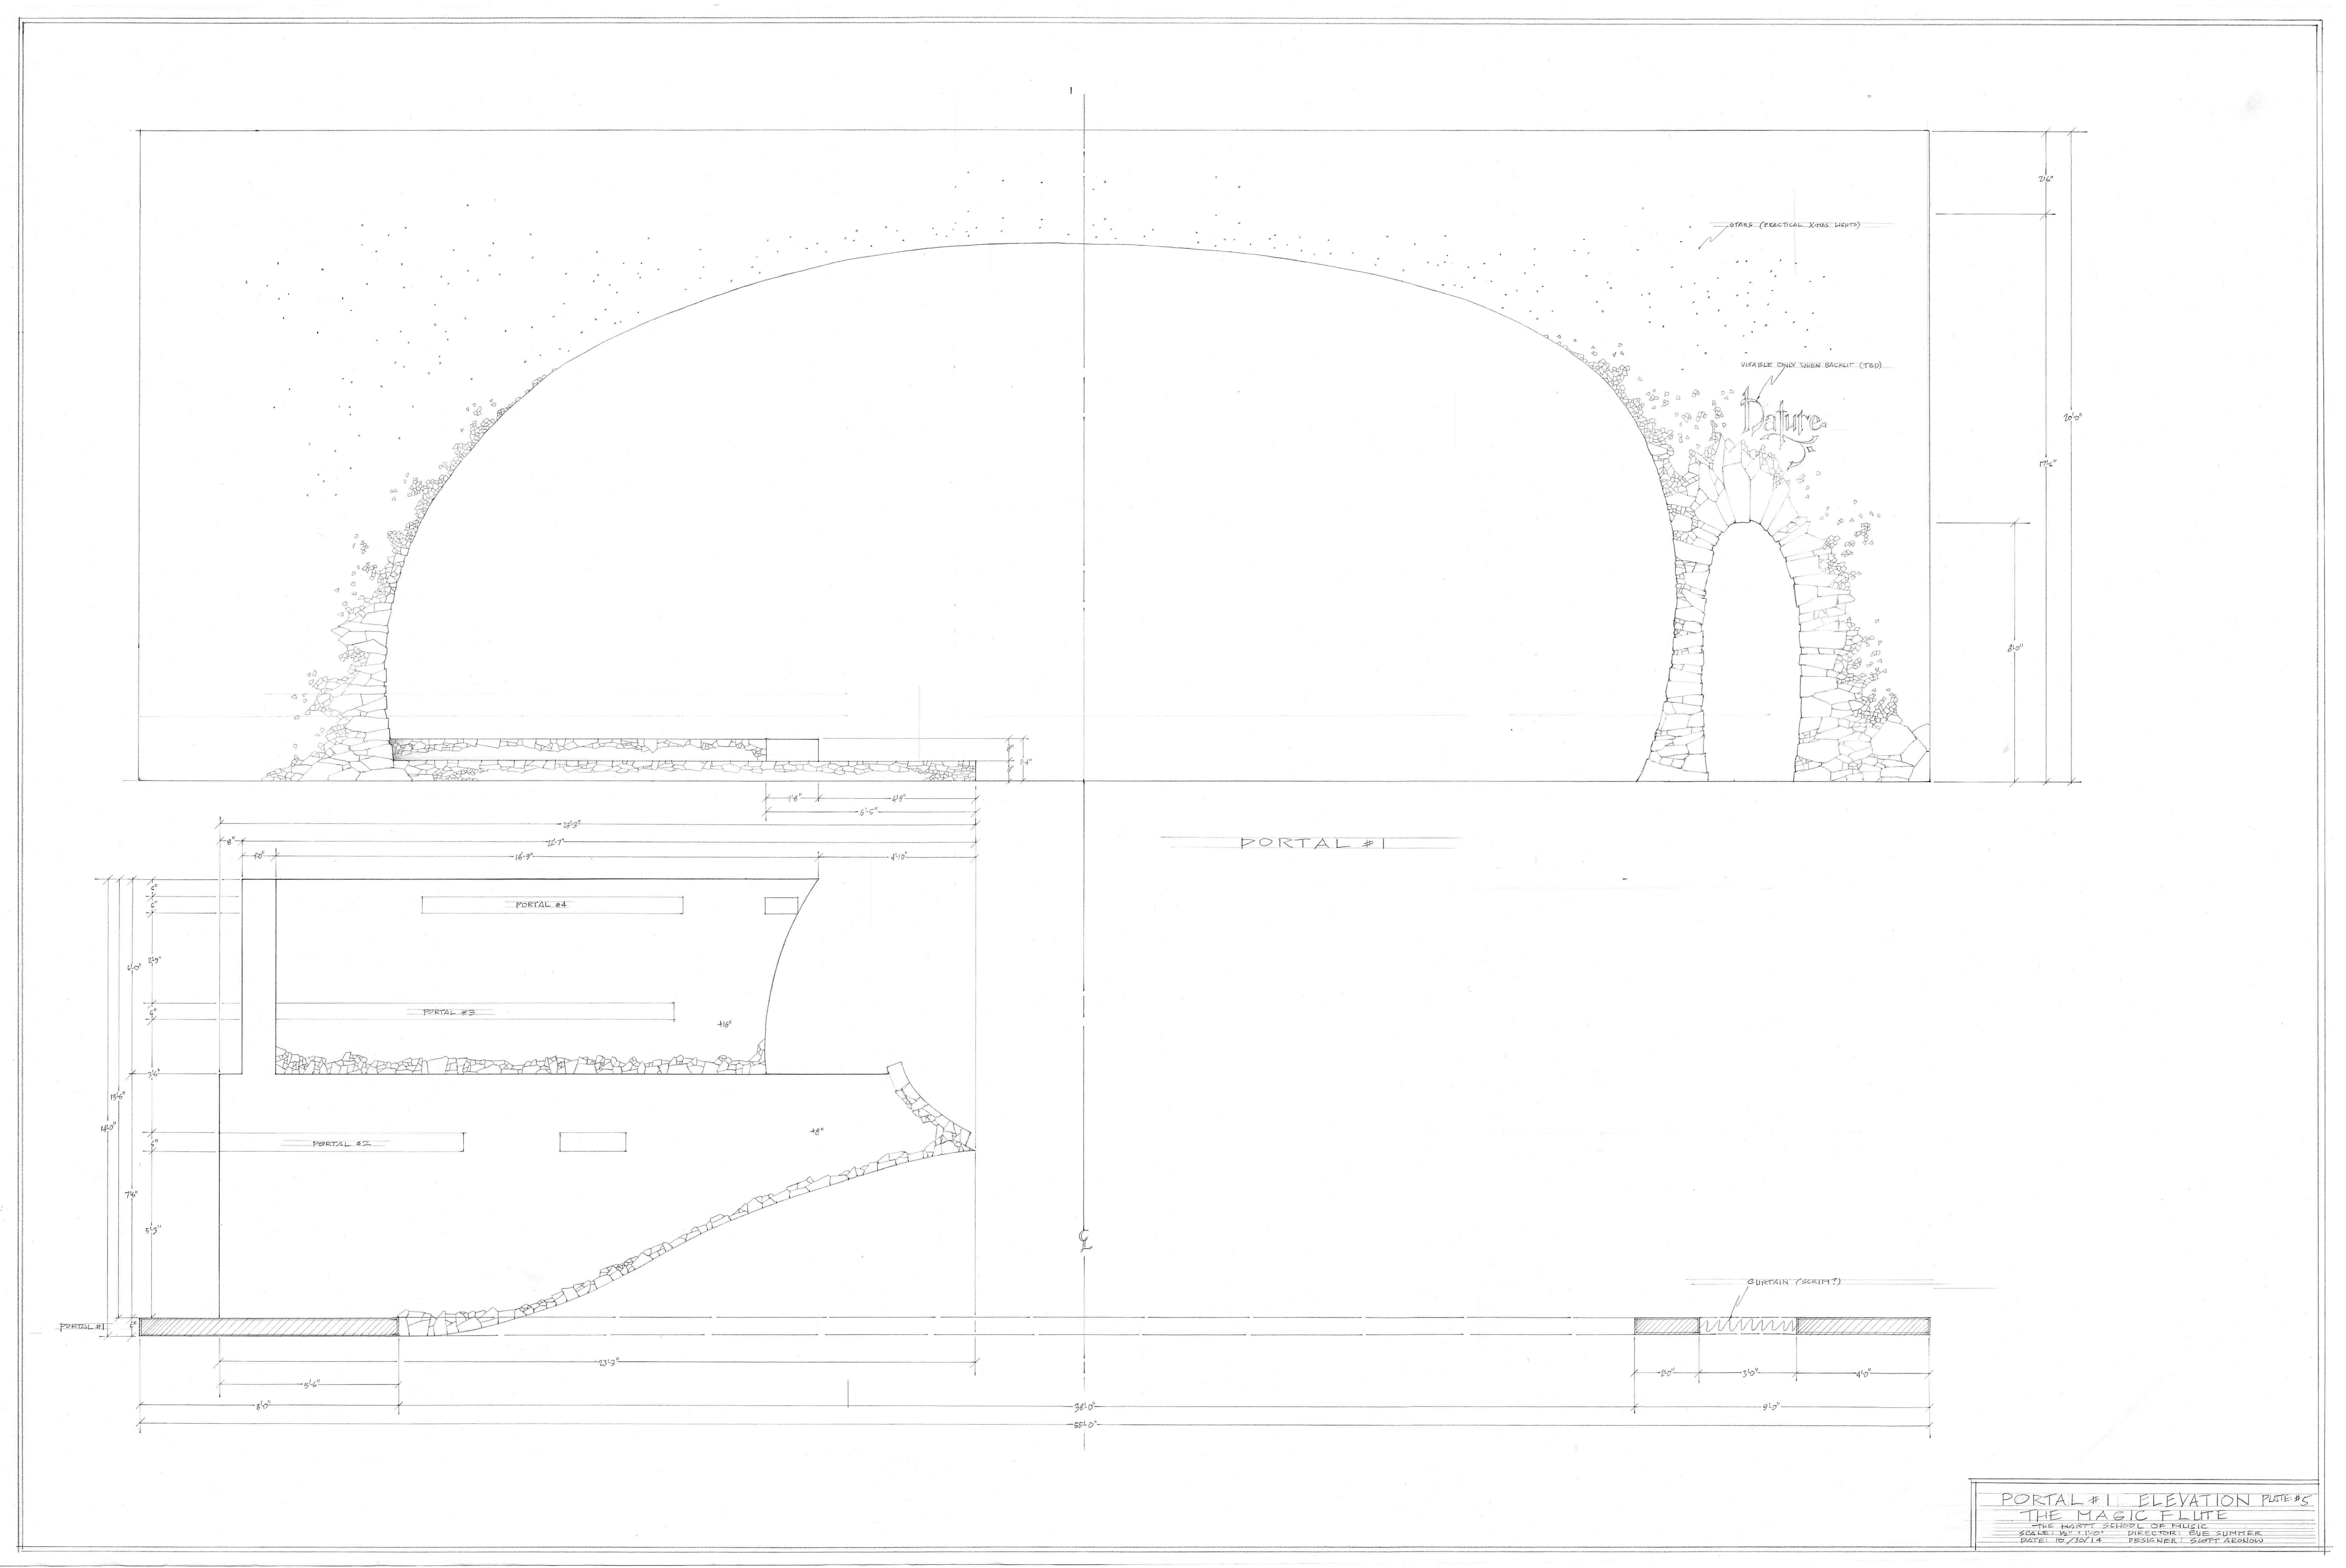 Plate #5. Portal #1 Elevation